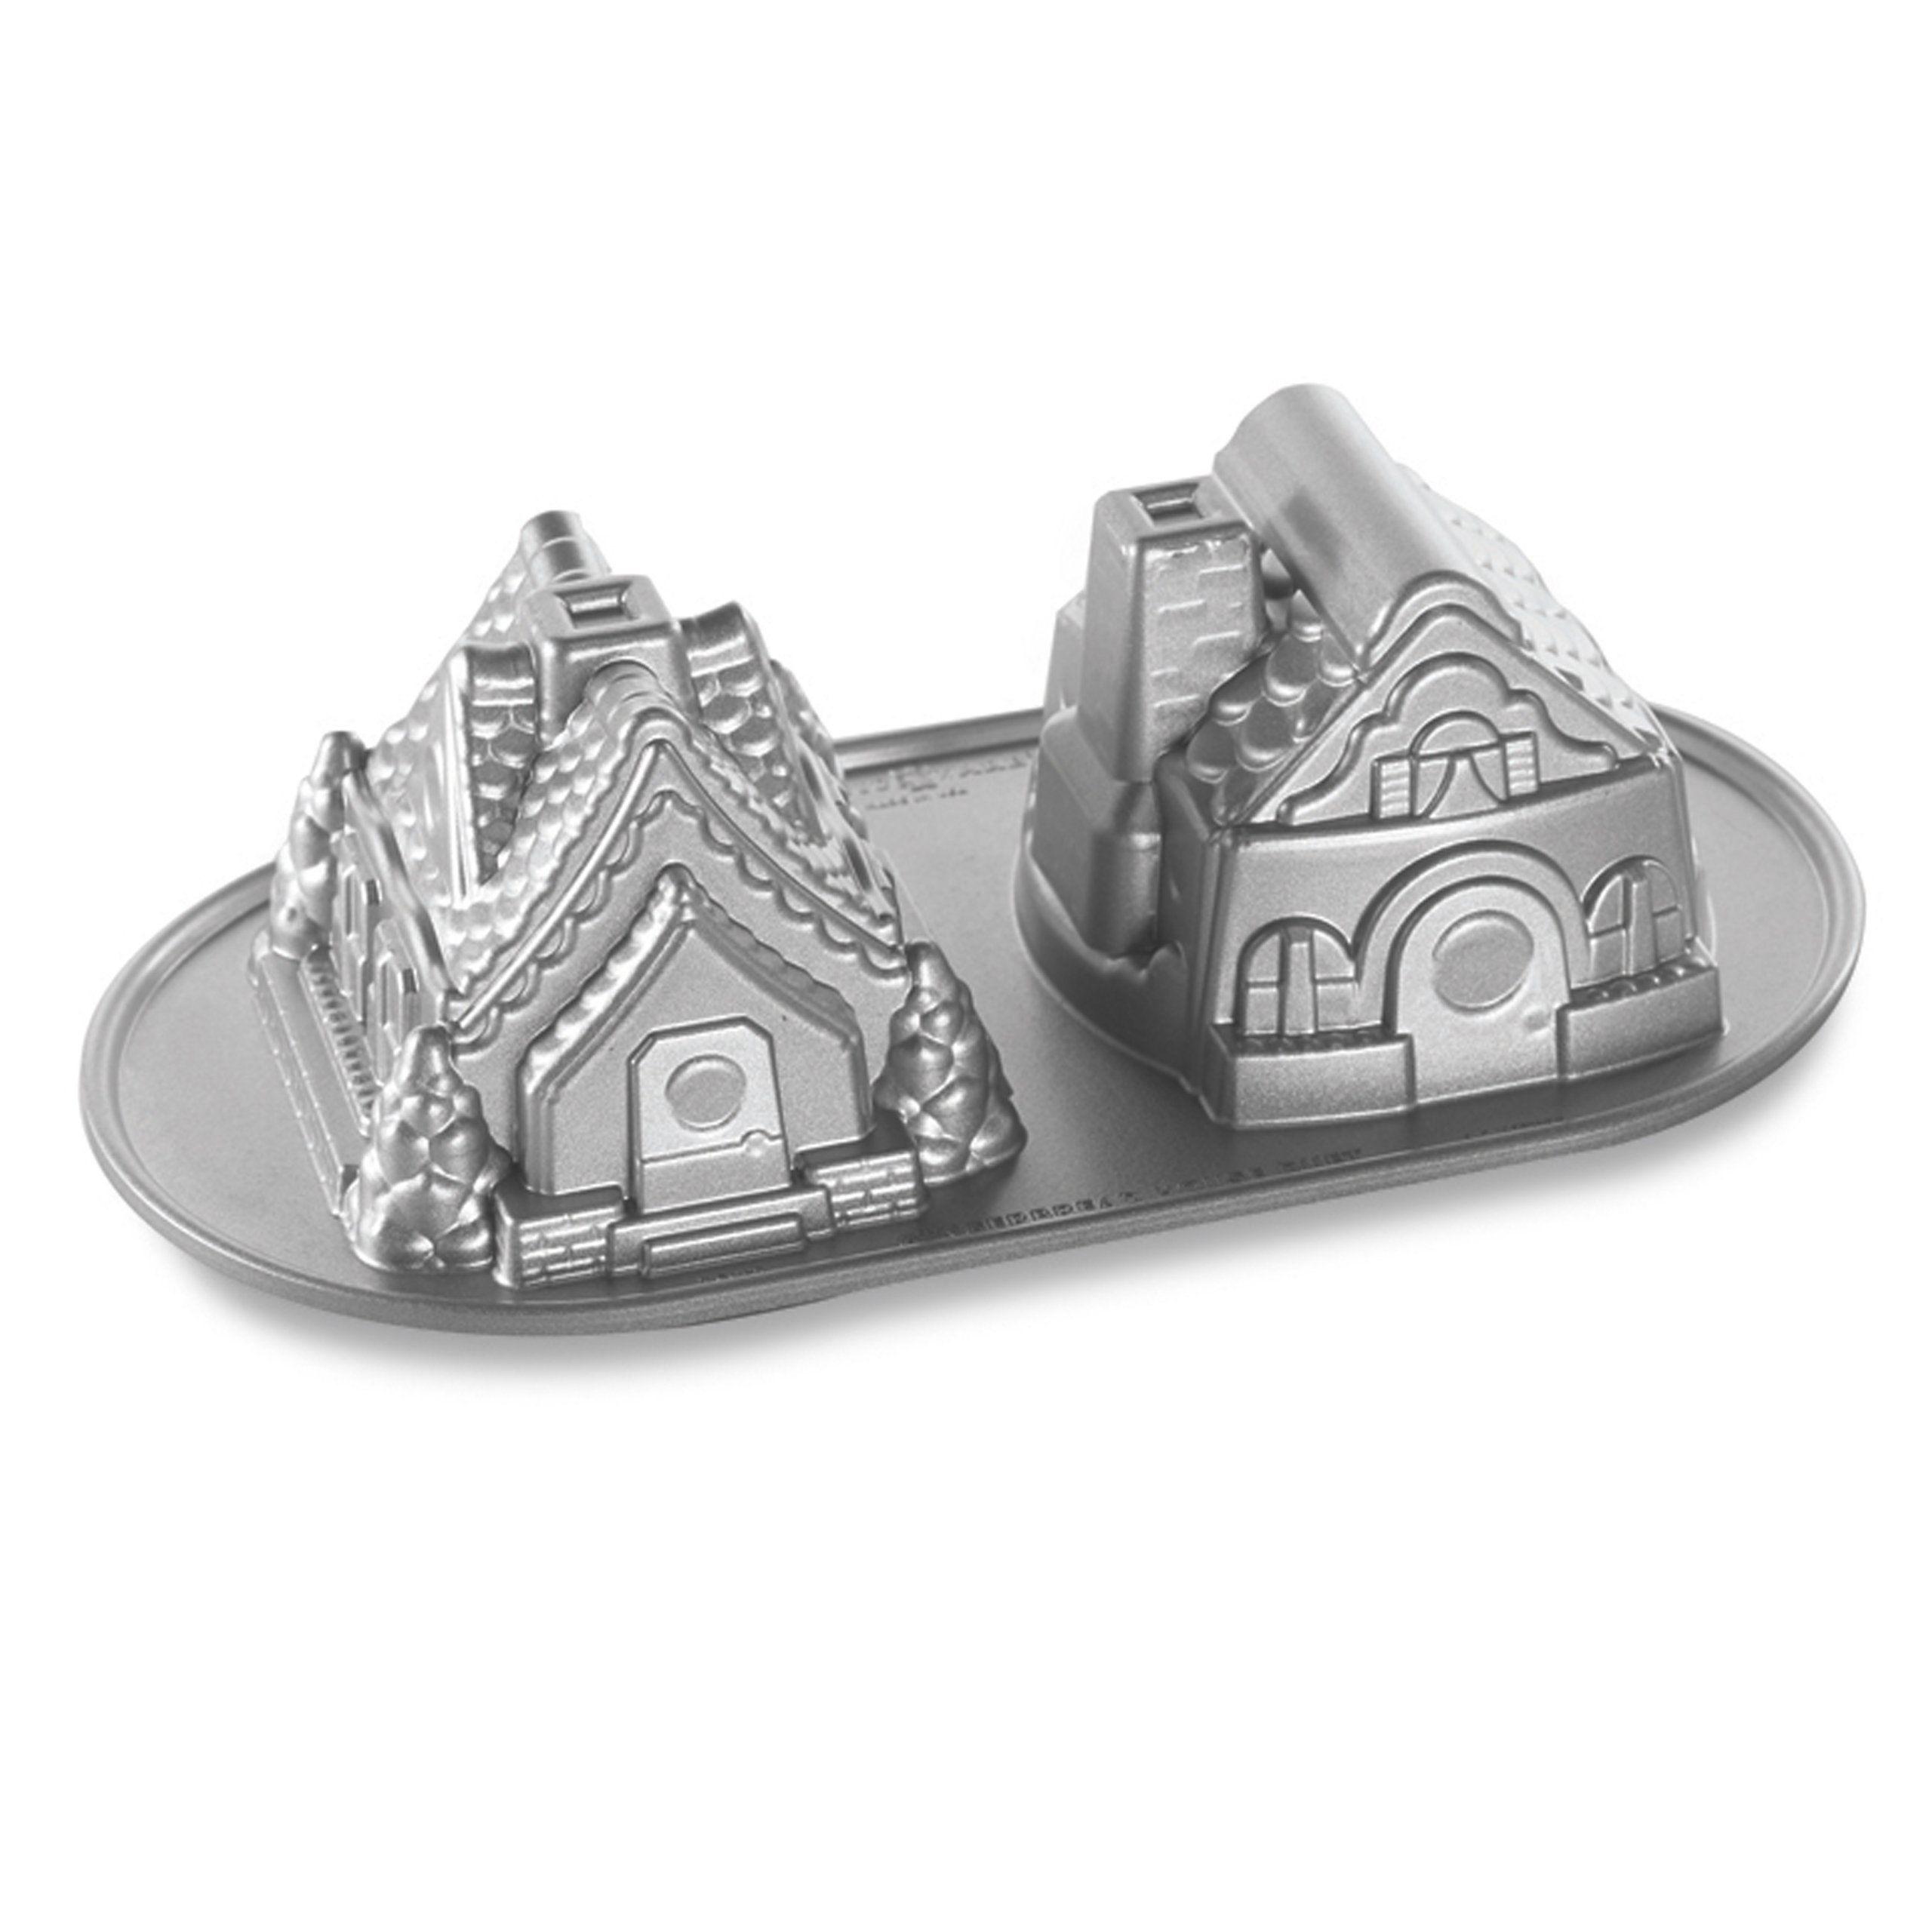 Nordic Ware Nordic Ware Gingerbread House Duet Pan Cake